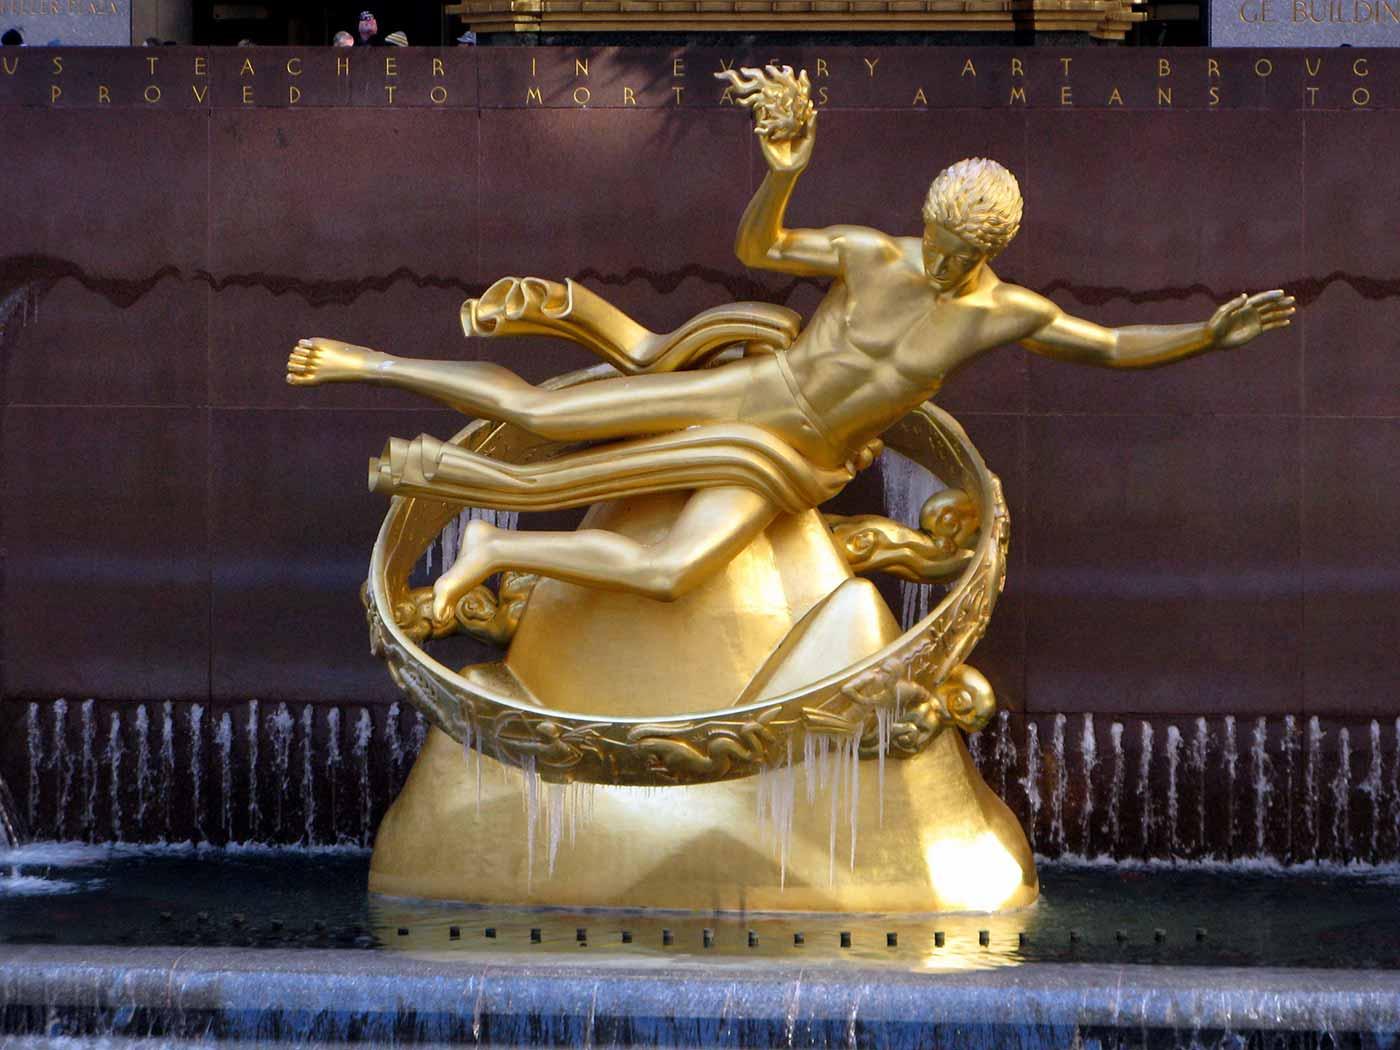 Prometheus at Rockefeller Center